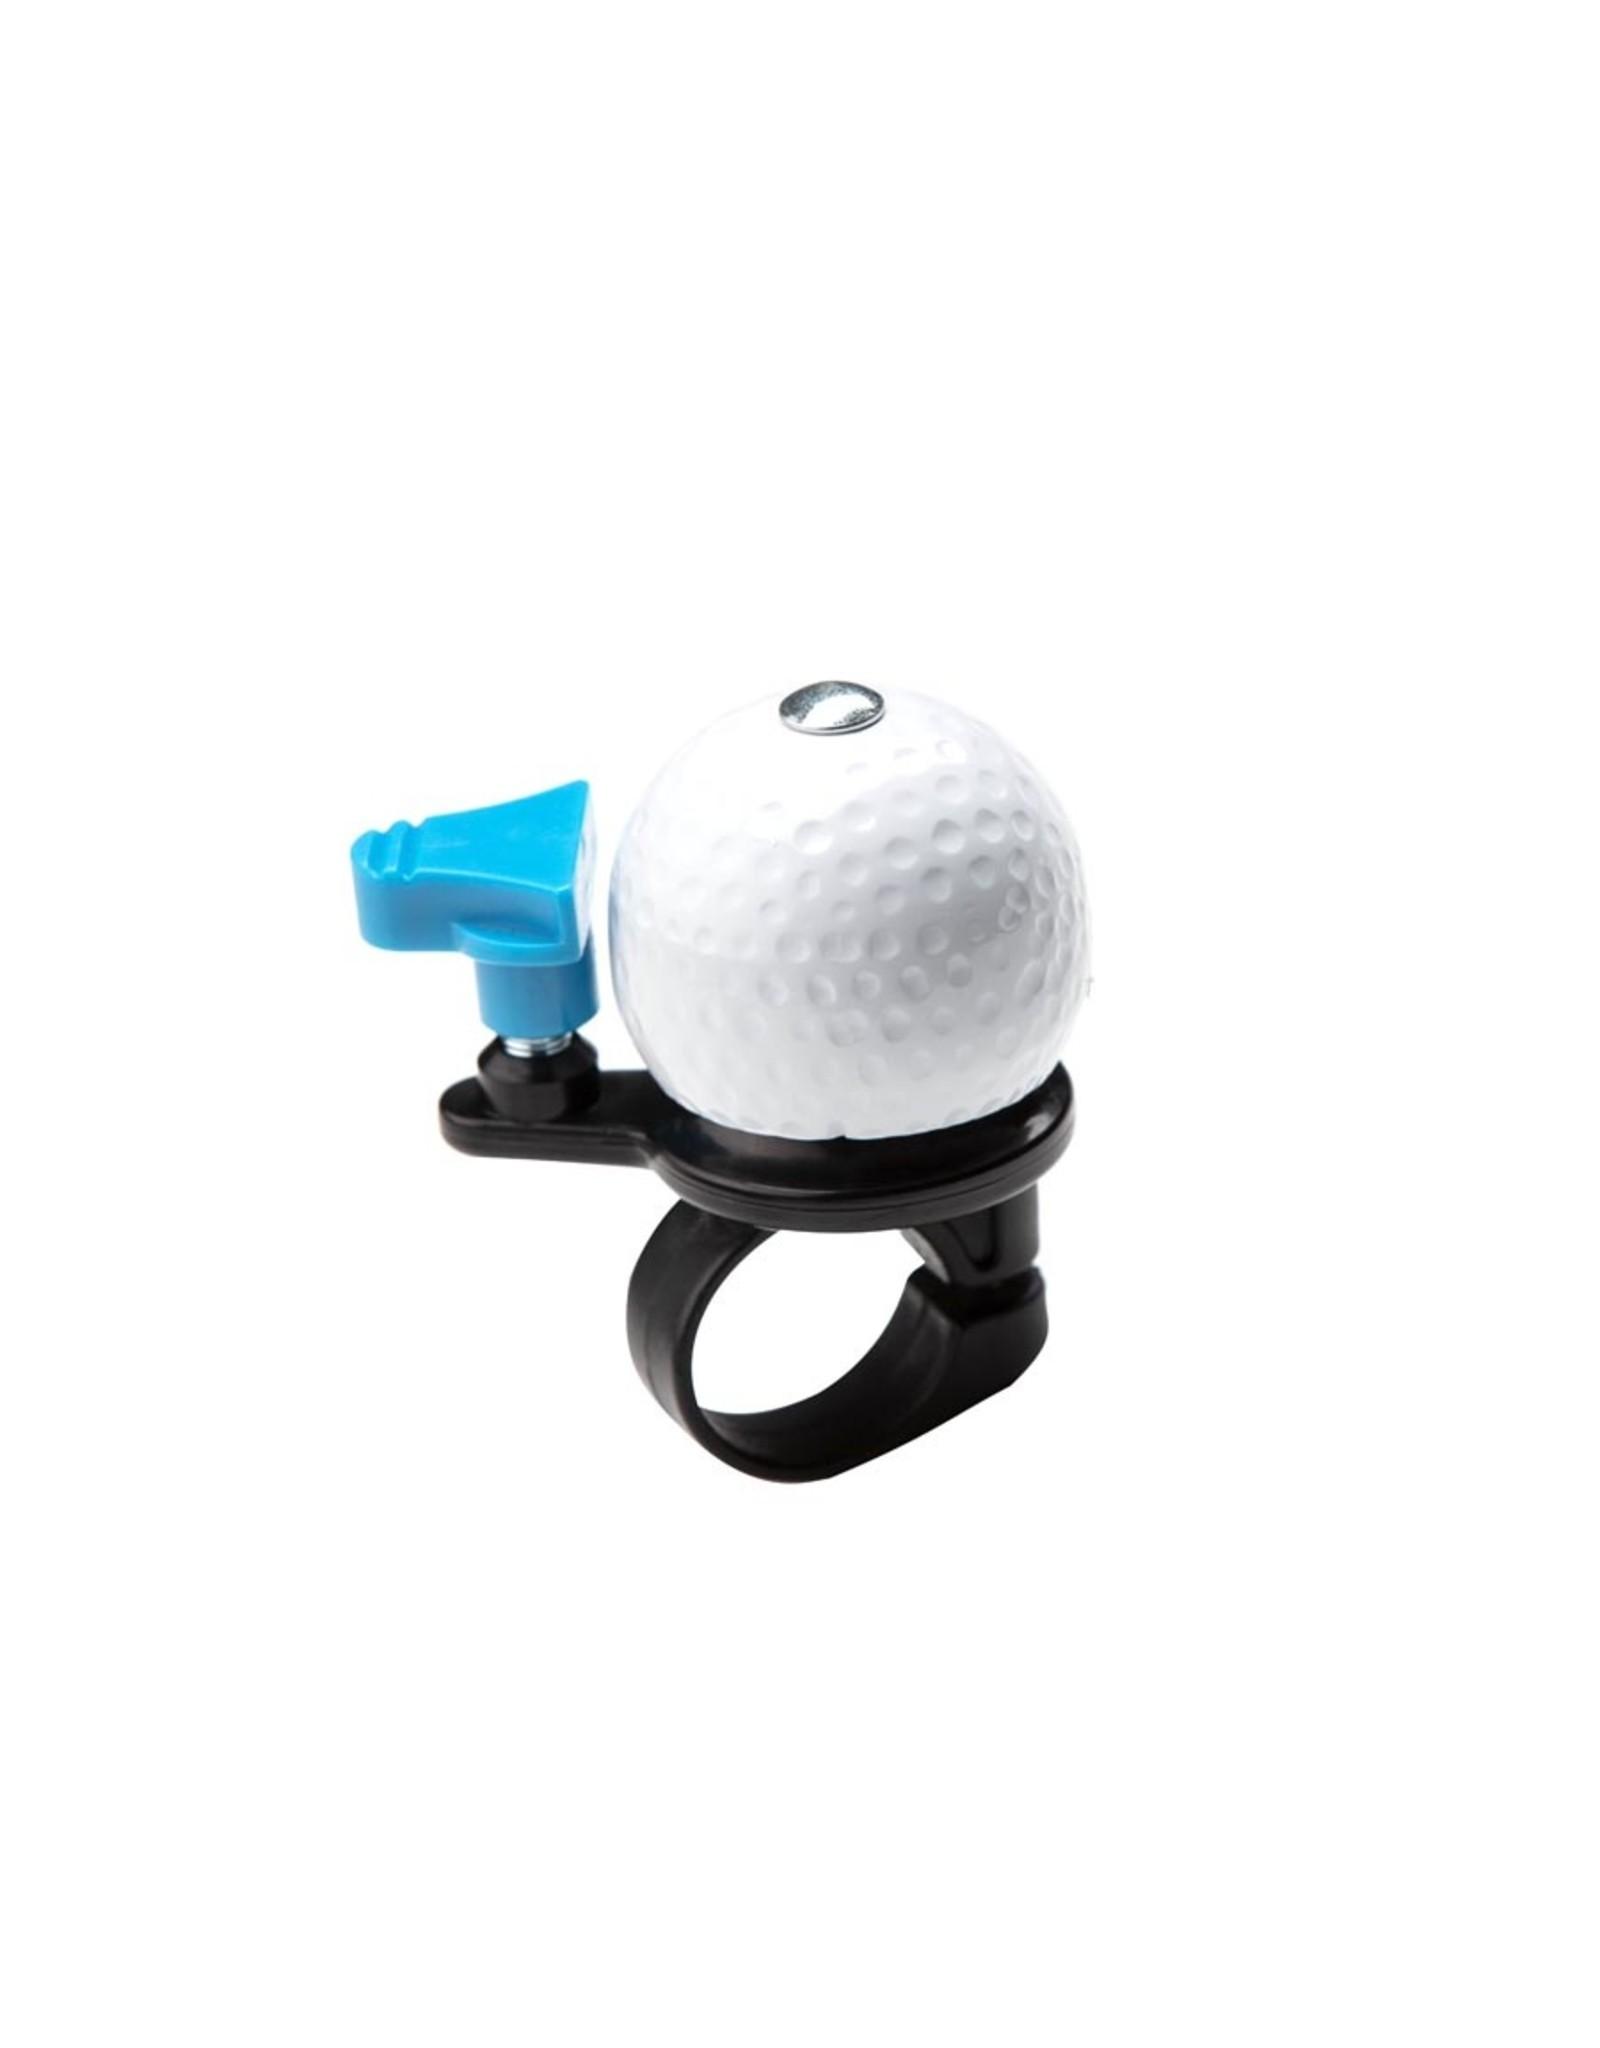 EVO, Ring-A-Ling Golf